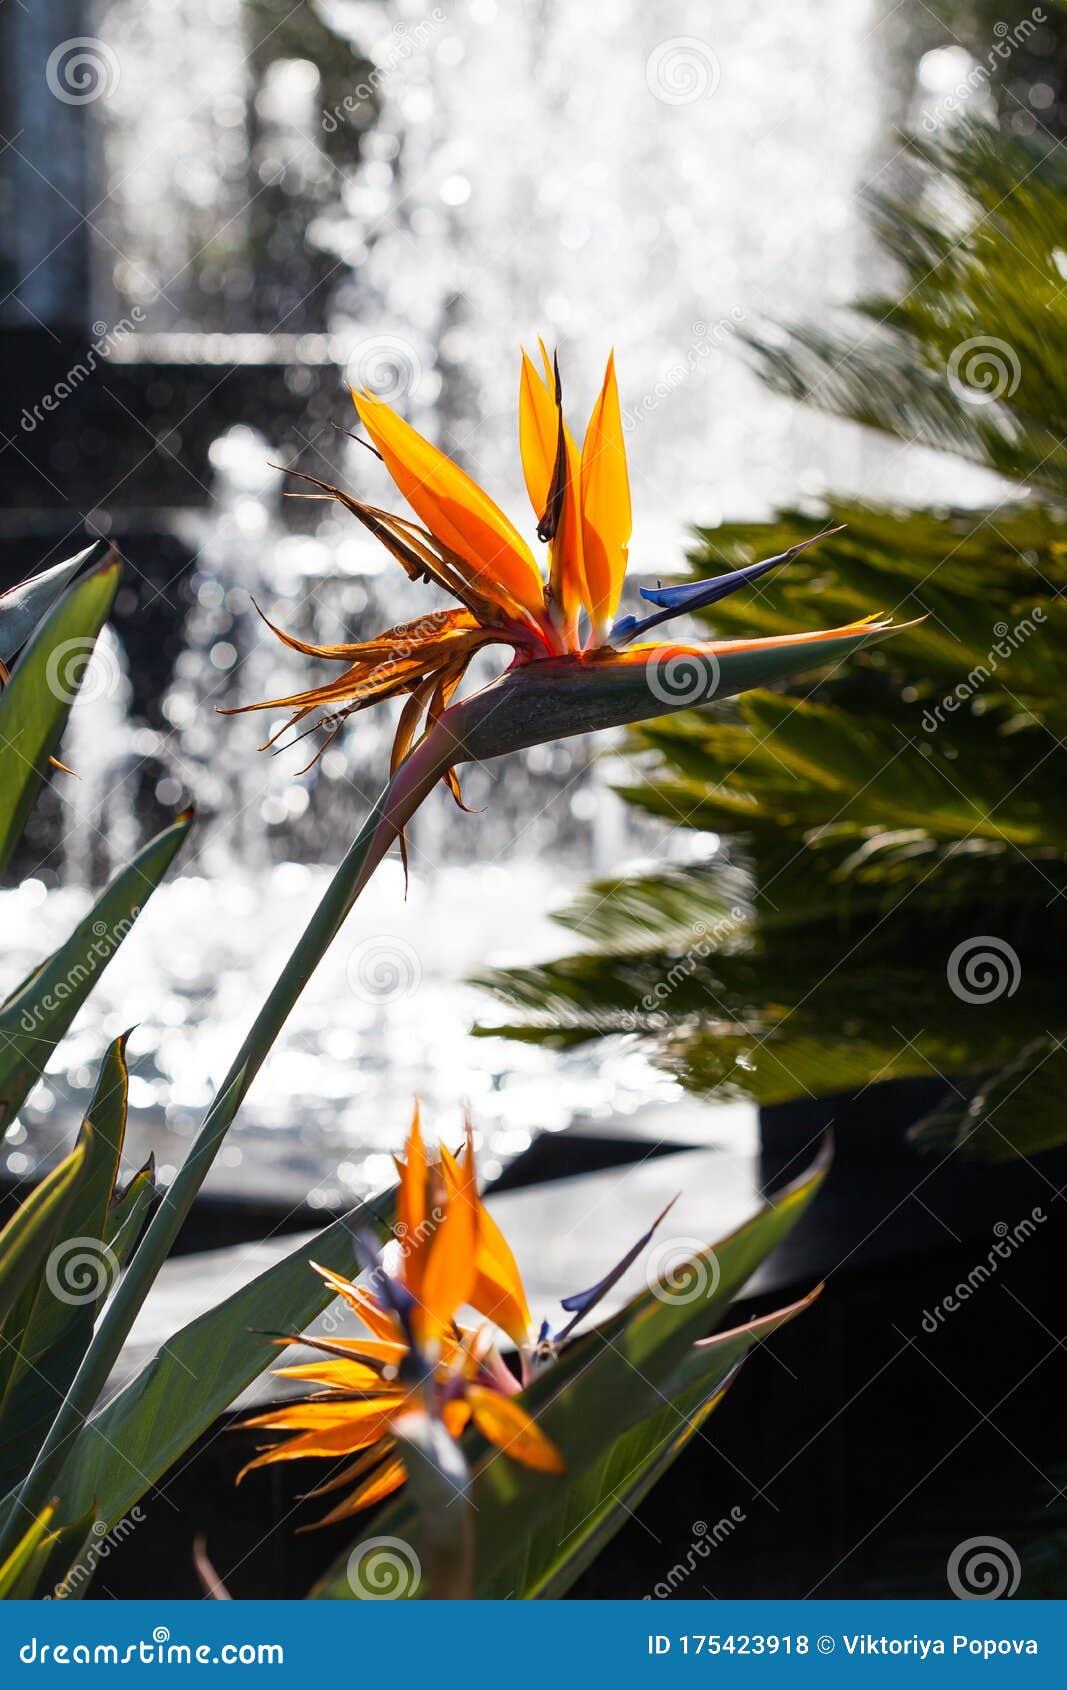 Gift Card Bird of Pardise Flowers